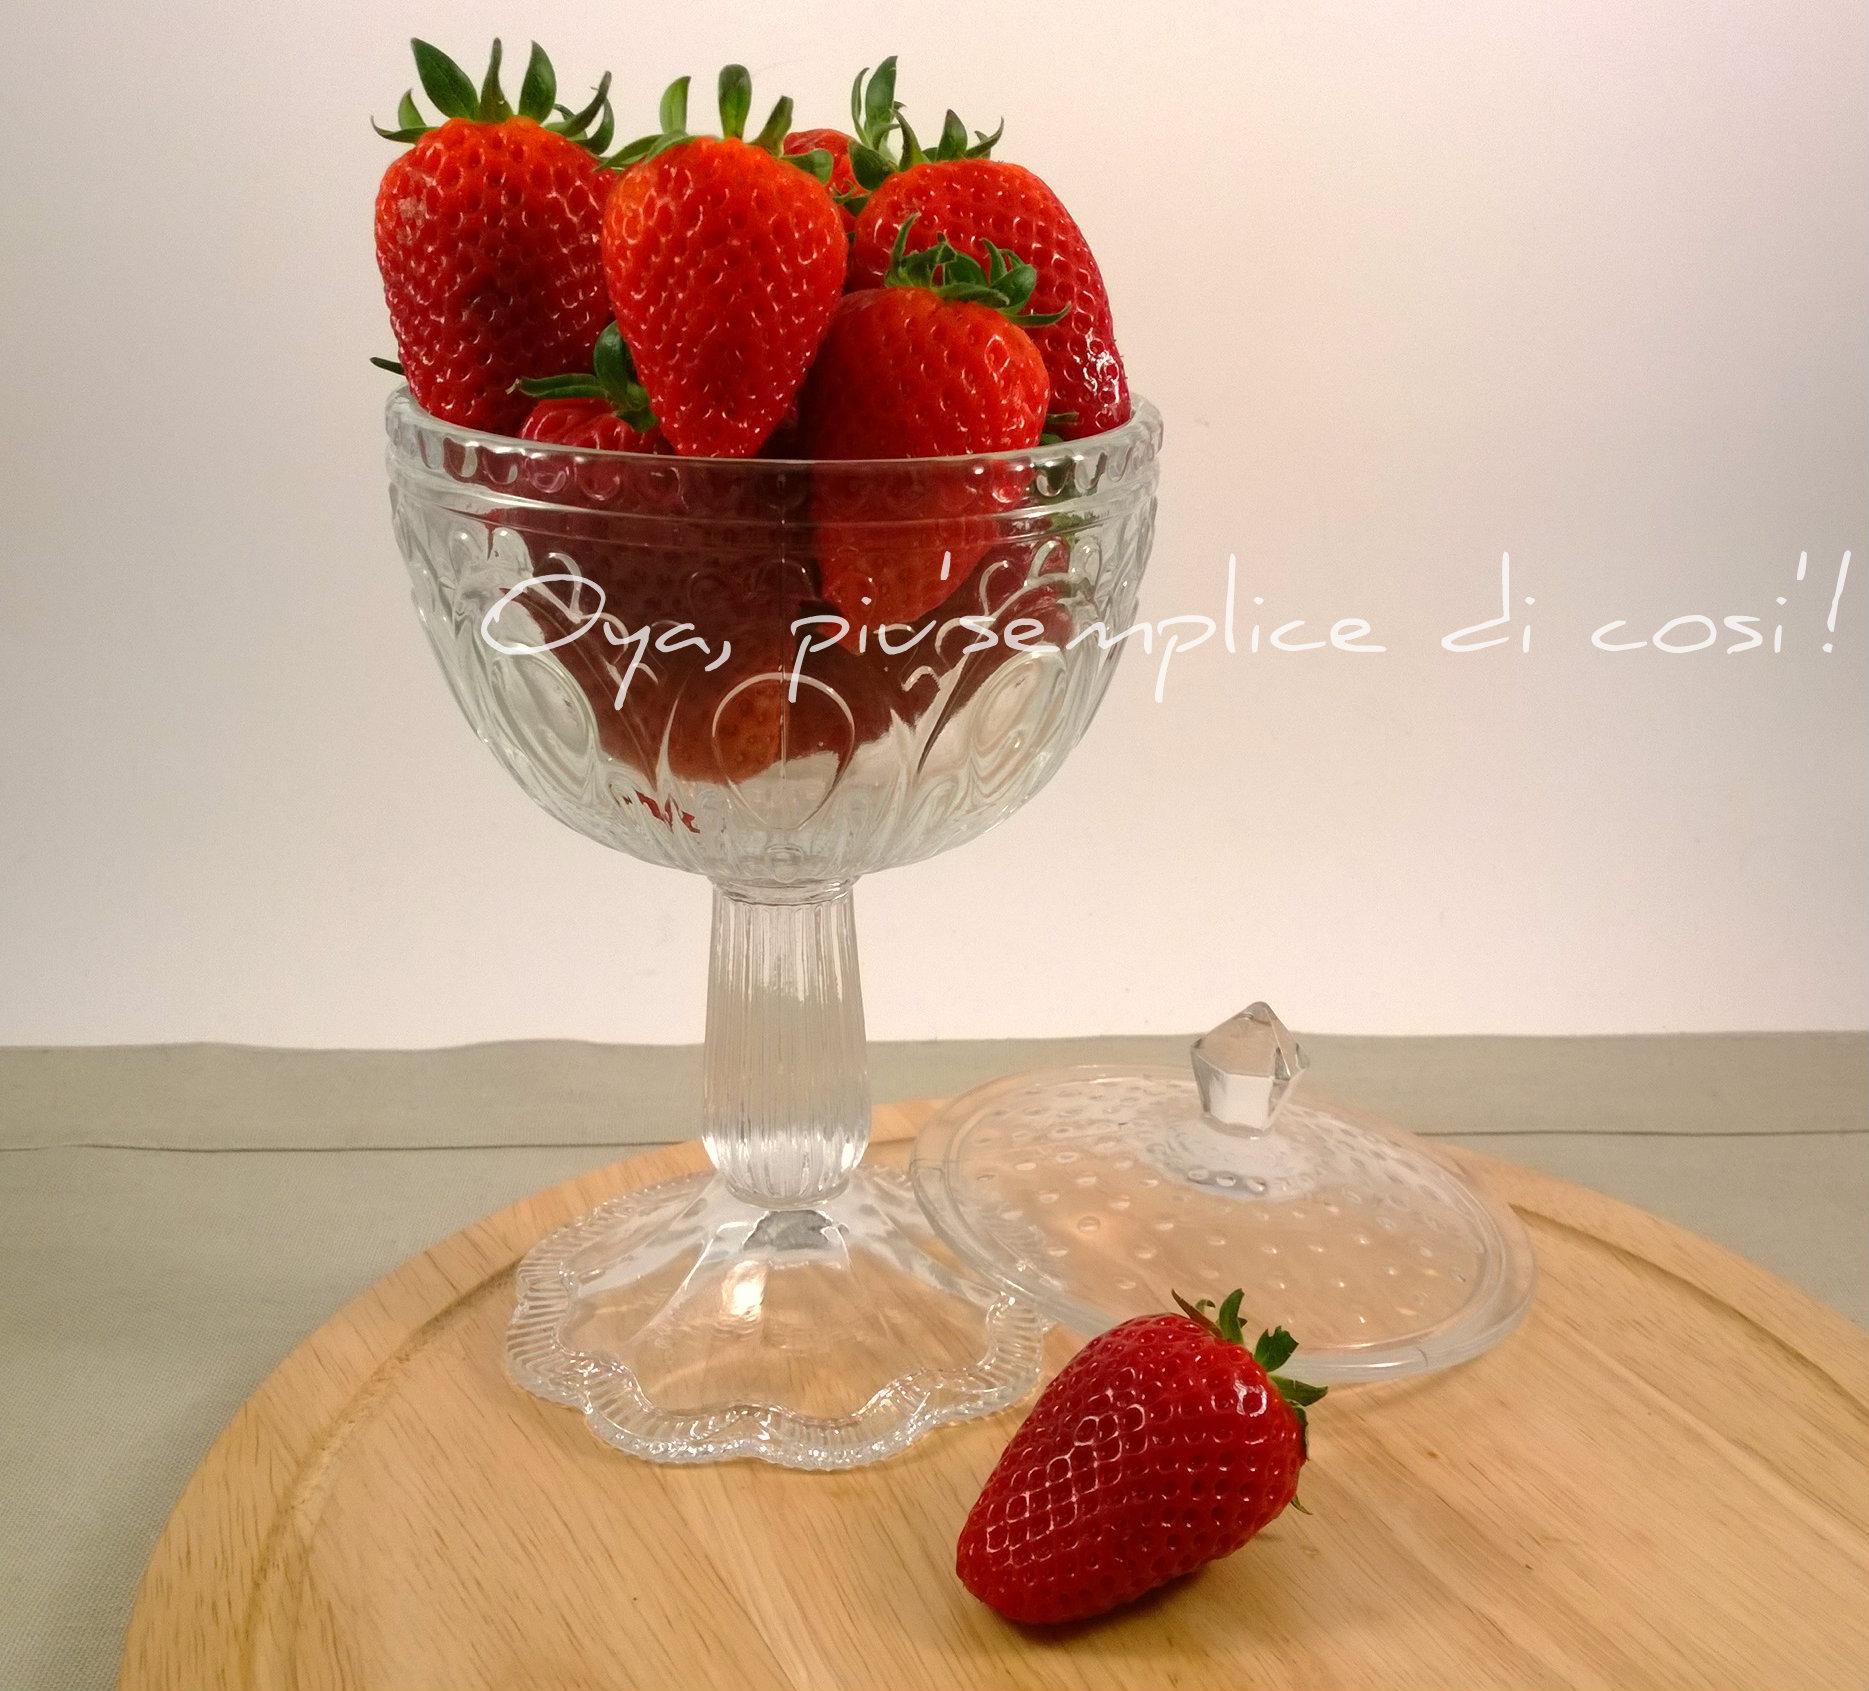 Ricette con le fragole | Oya